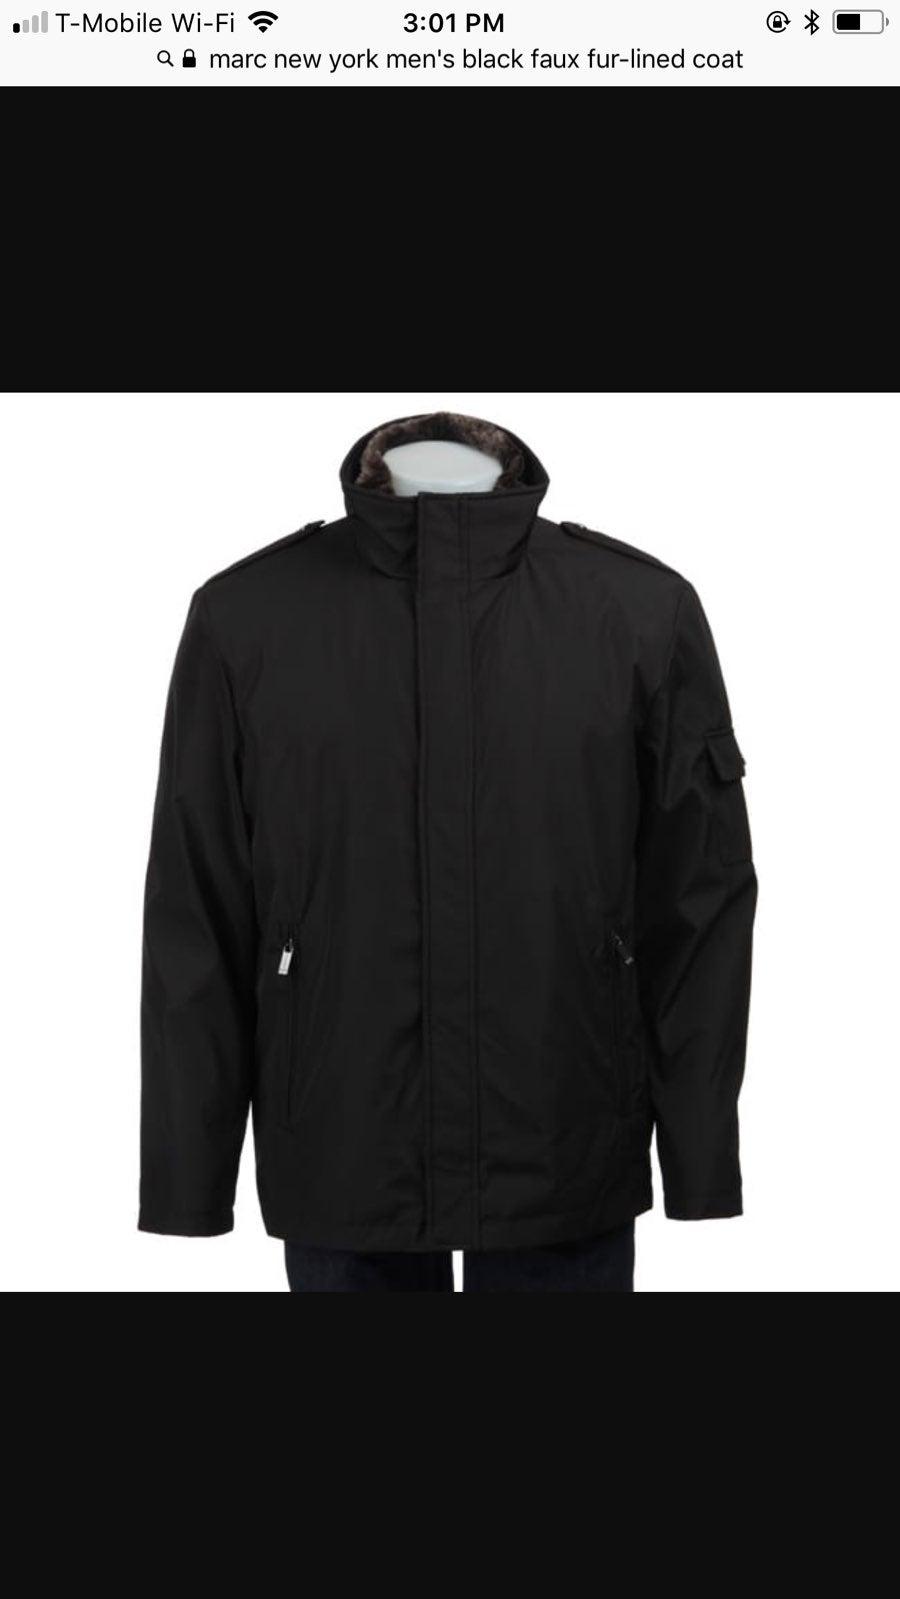 Marc New York Fur Lined Coat Jacket